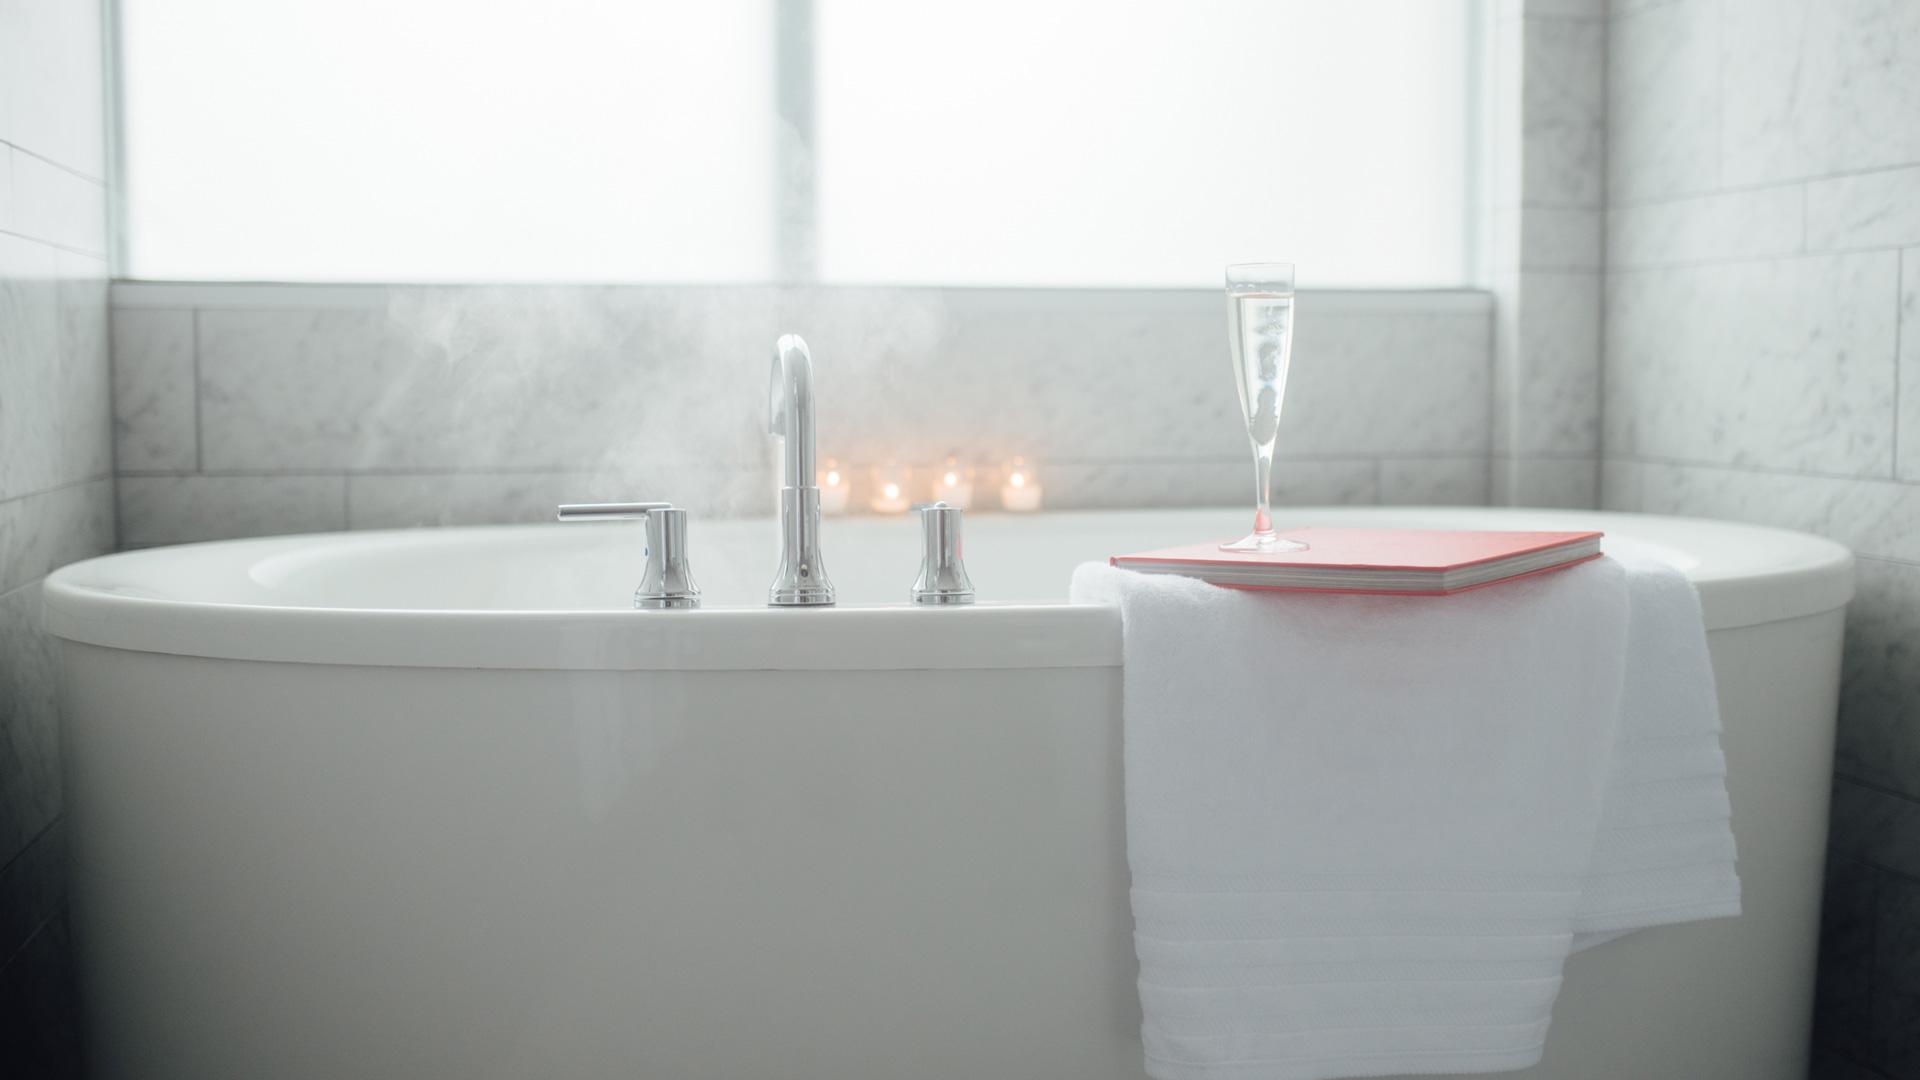 Preston bathtub with champagne glass